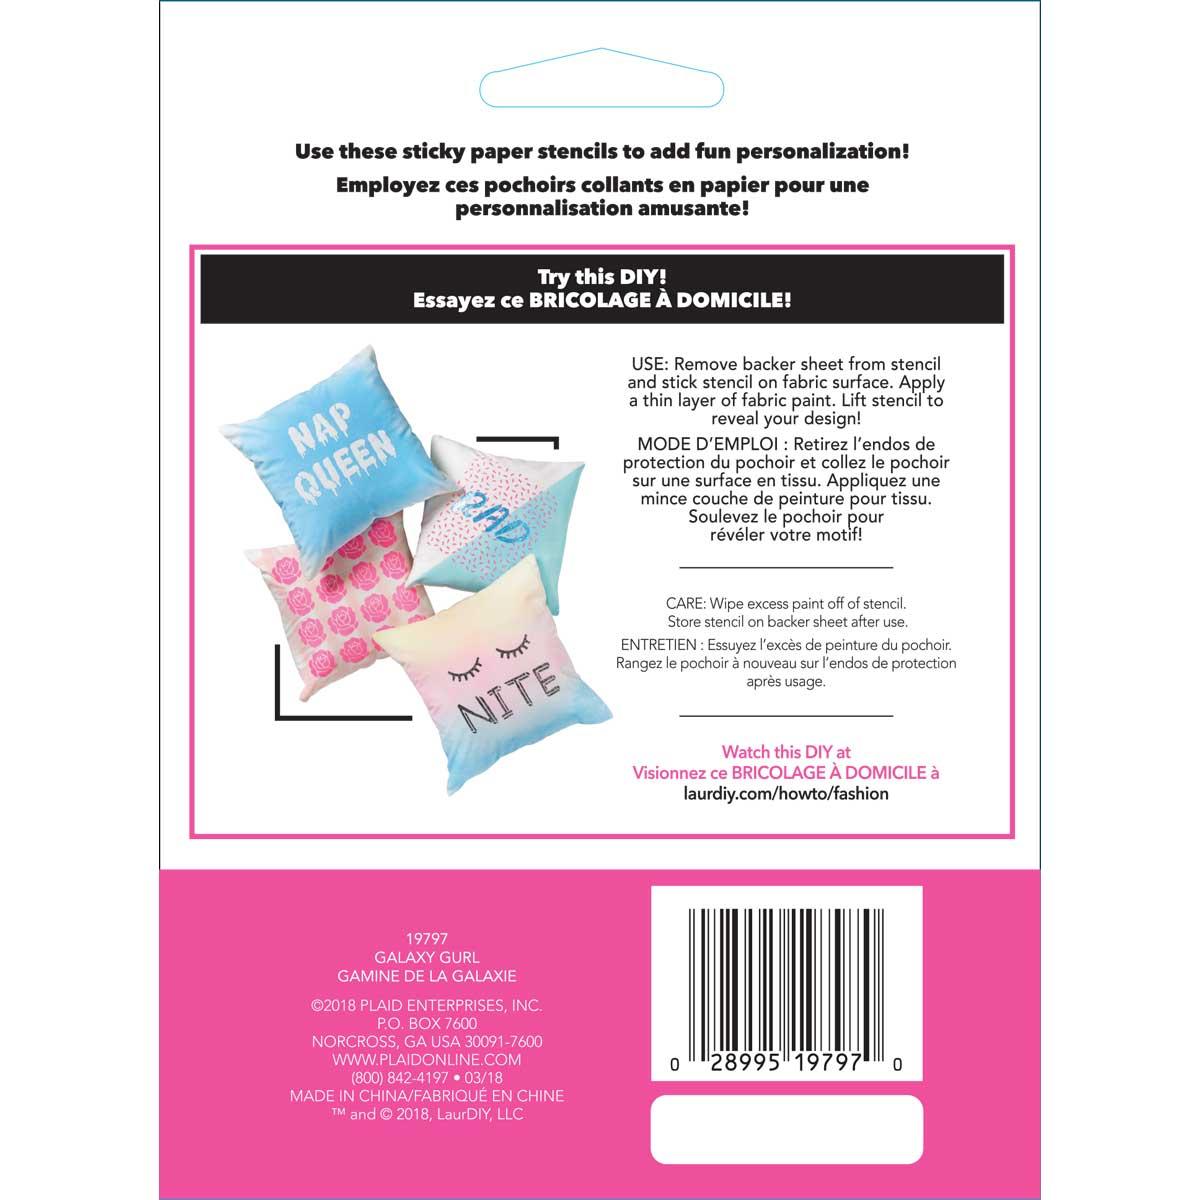 LaurDIY ® Peel & Stick Paper Alphabet Stencils - Galaxy Gurl